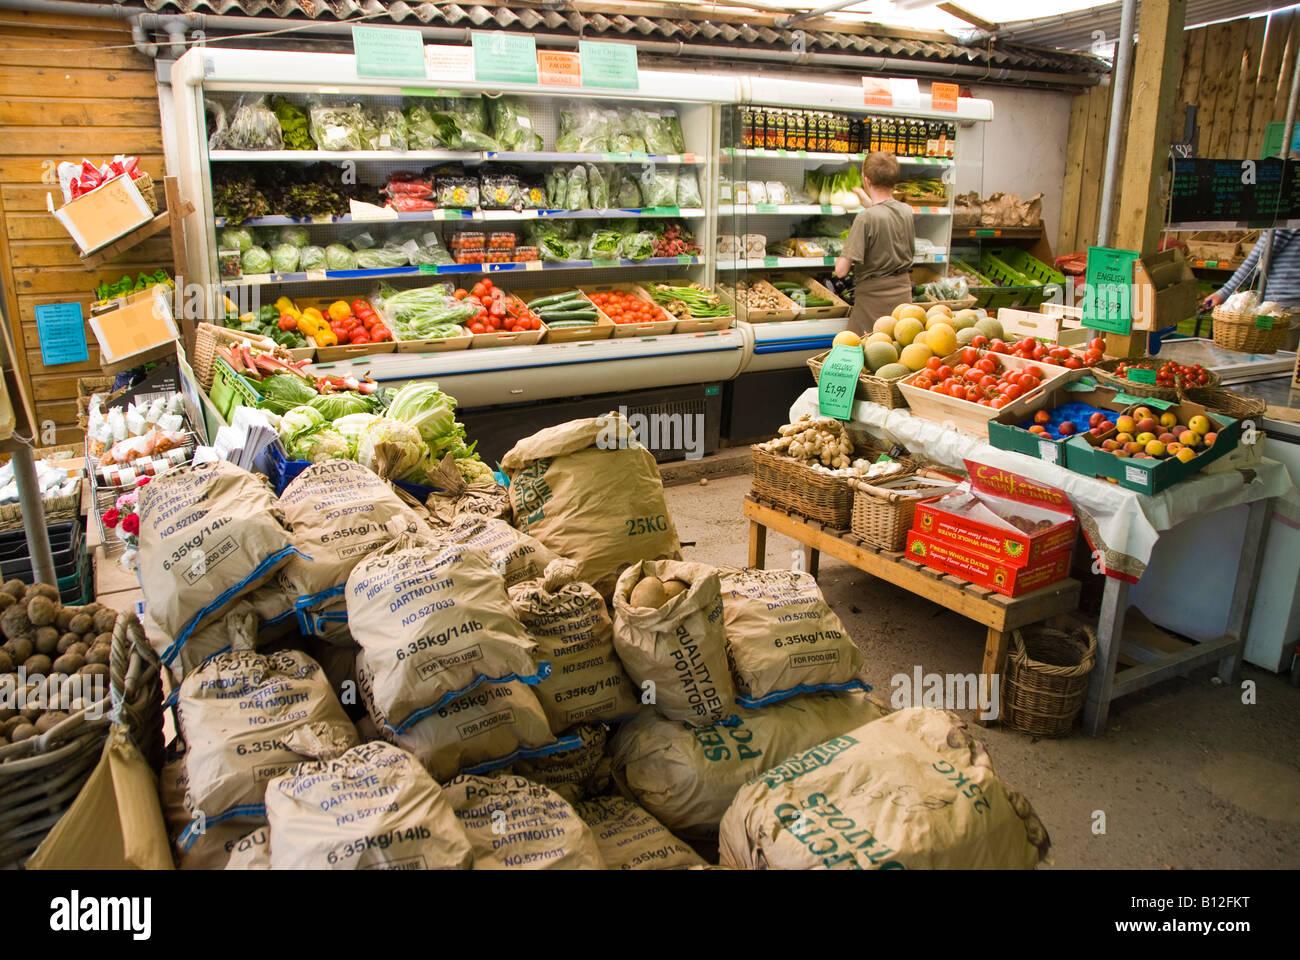 Riverford organic farm shop in Devon - Stock Image